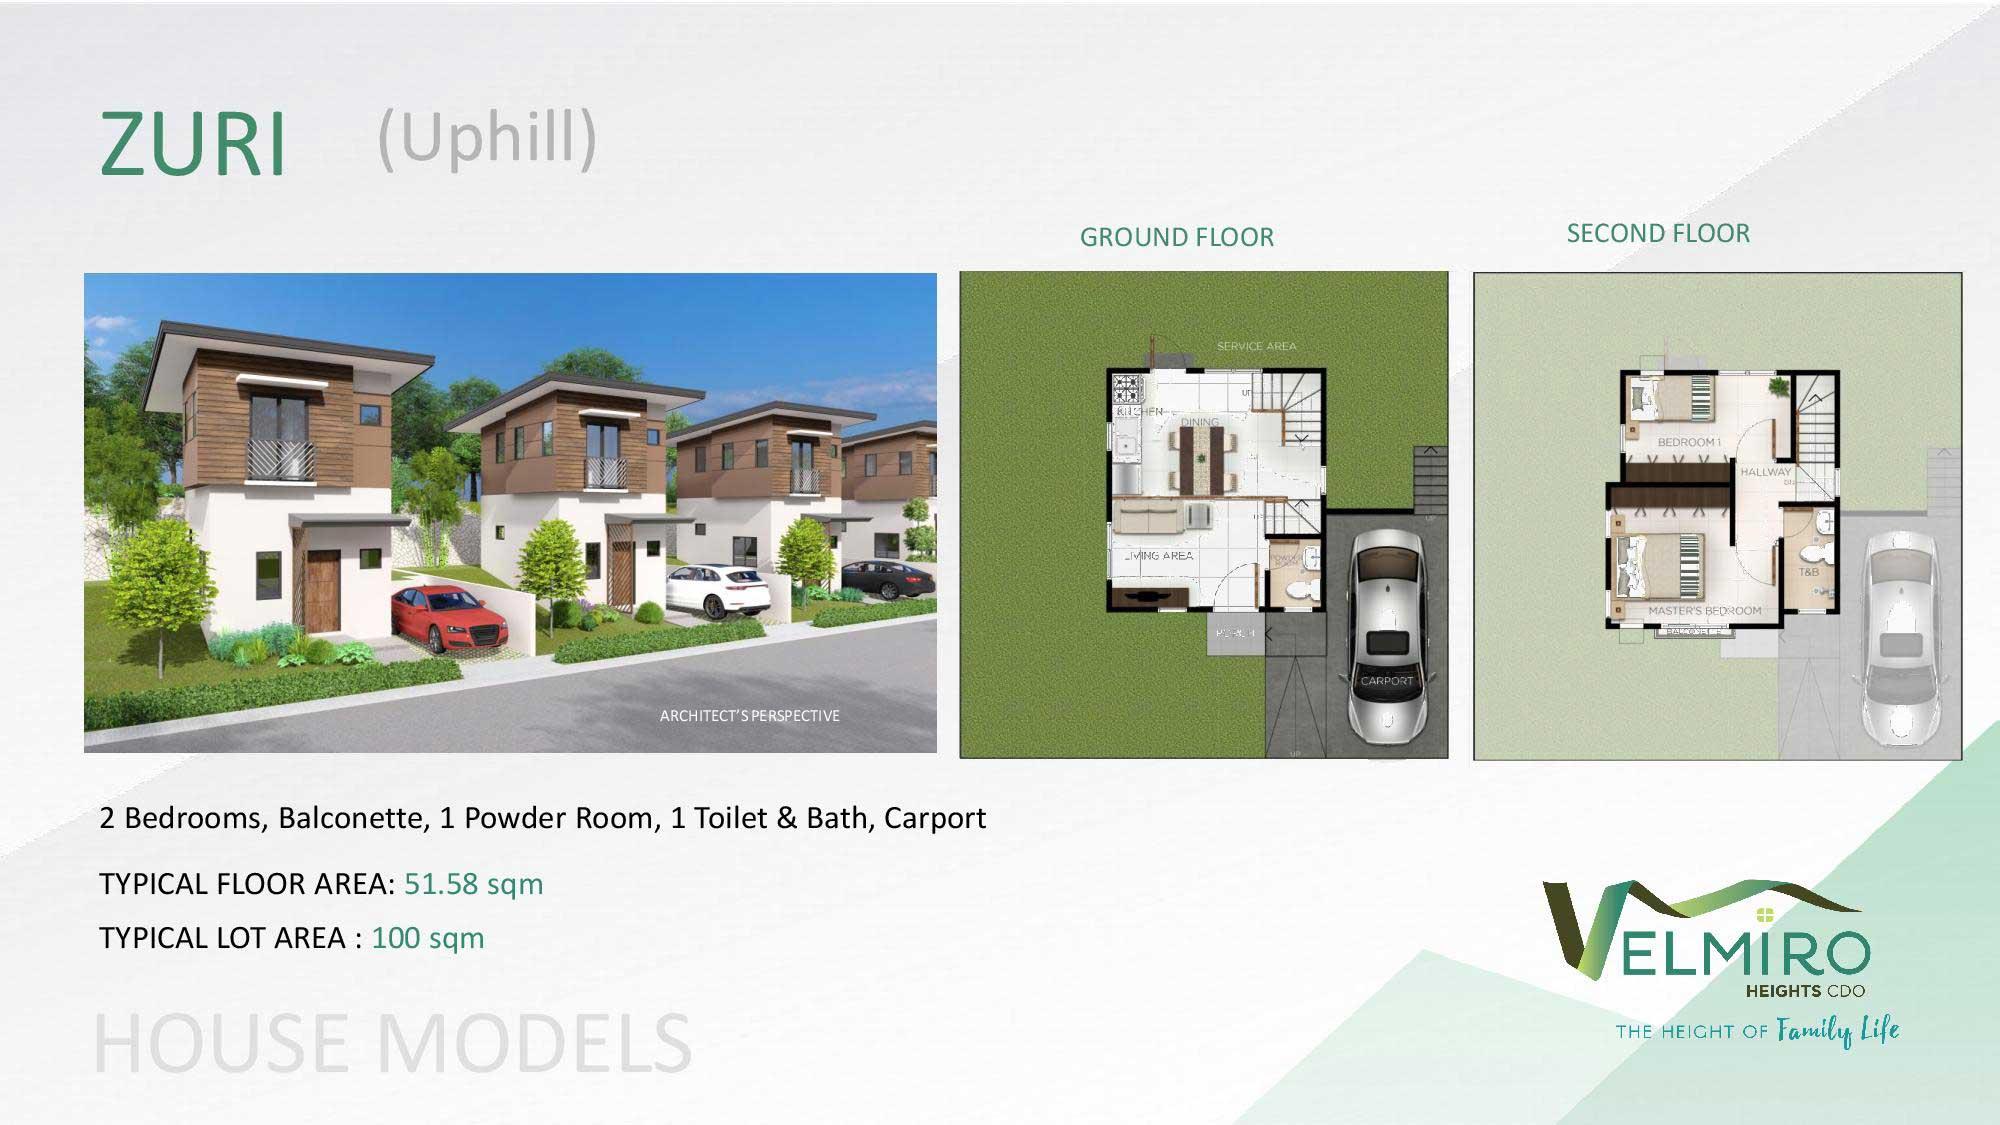 Velmiro heights agusan house model zuri uphill web gmc